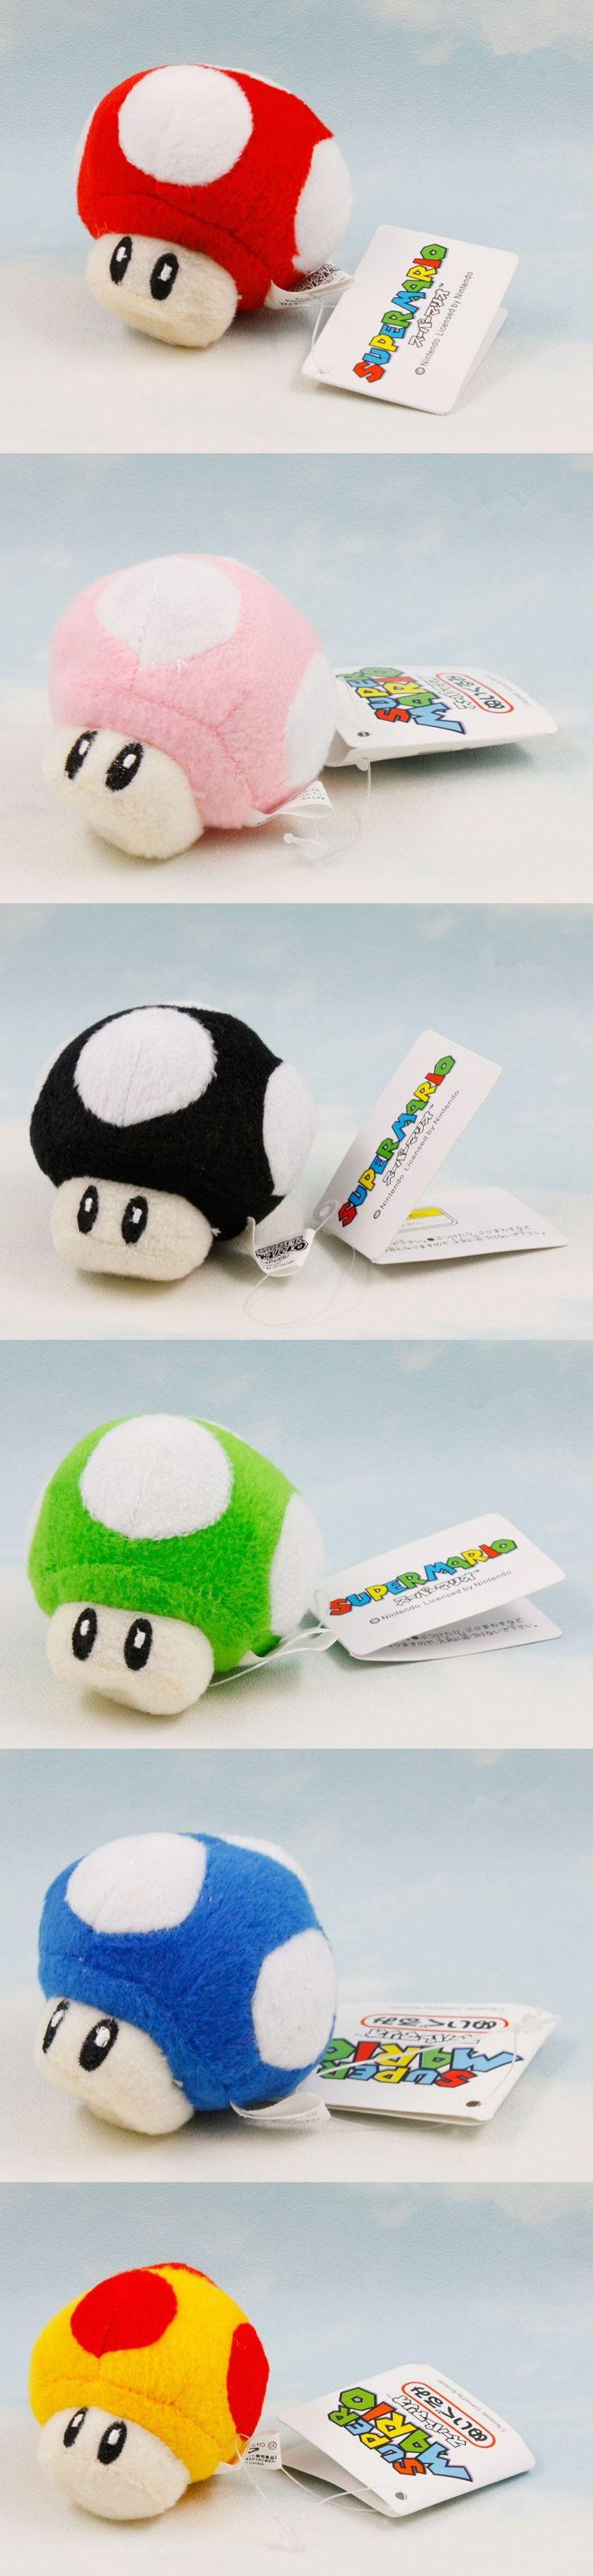 Hot Japan Super Mario Anime Figures 8cm Mini Mario Bros Luigi Yoshi Mushrooms Cartoon Game Toys Kids Toy